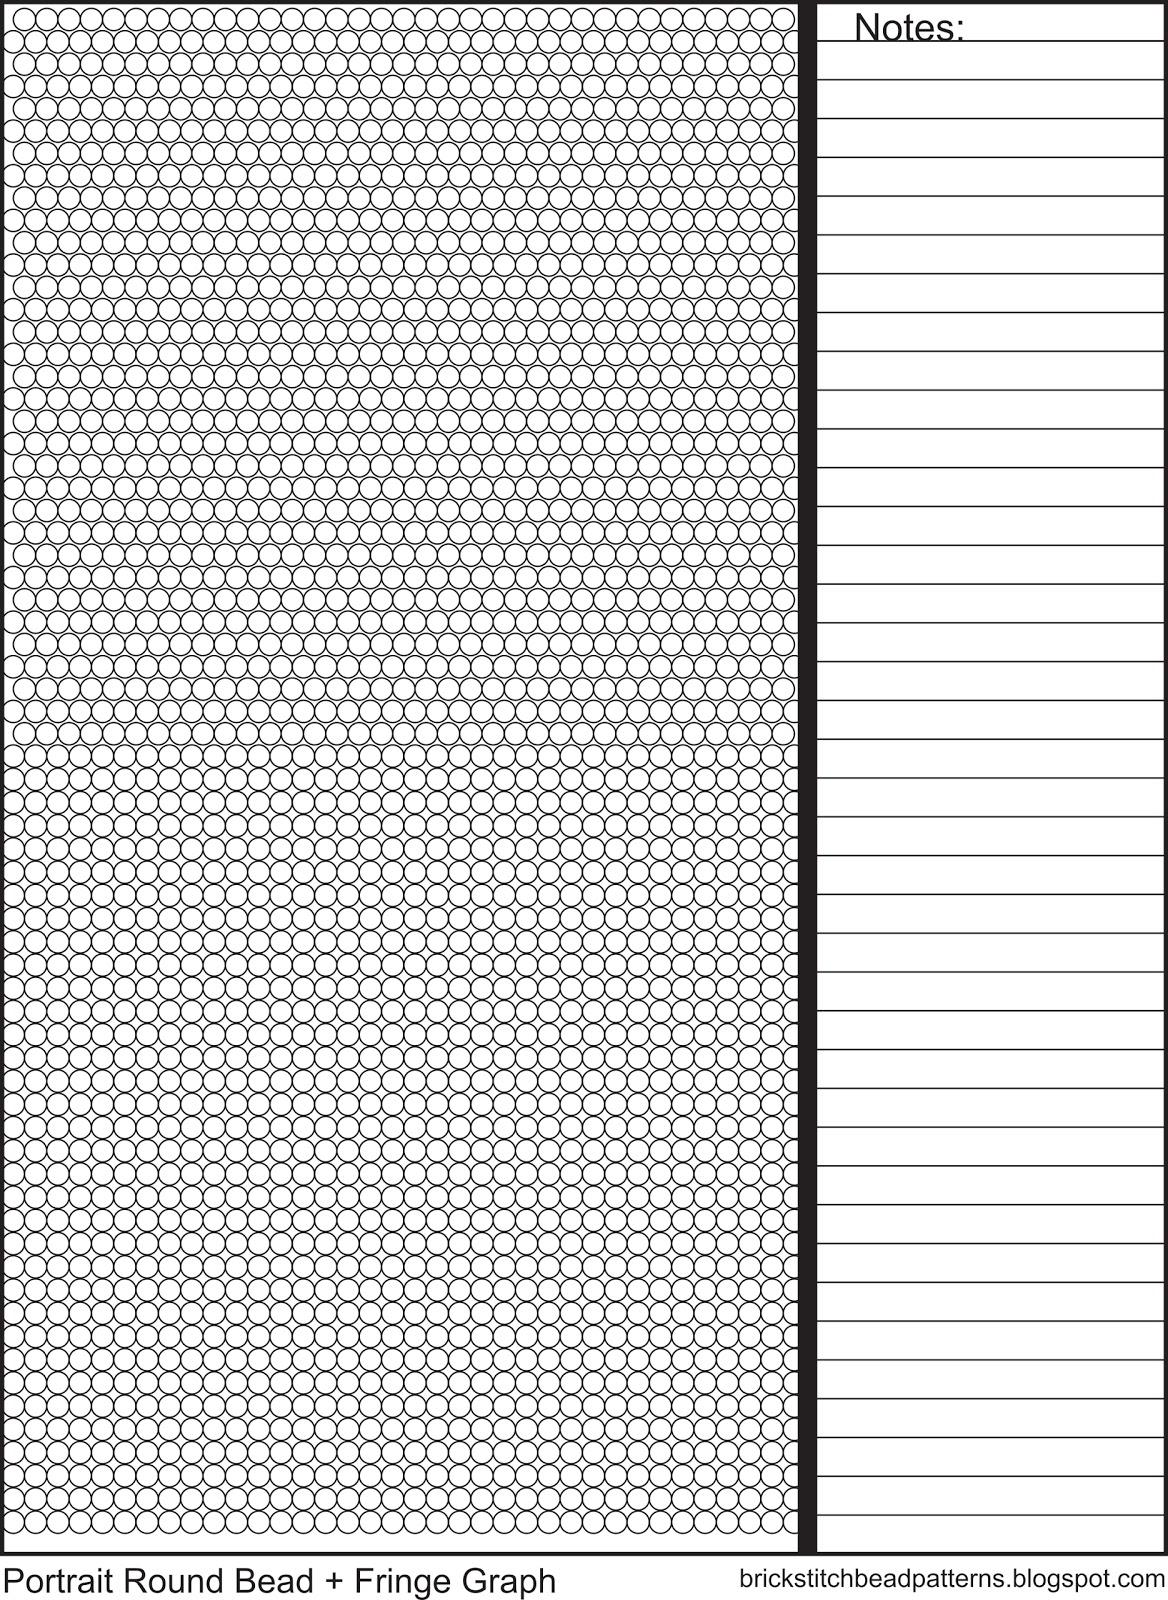 Brick Stitch Bead Patterns Journal Universal Round Seed